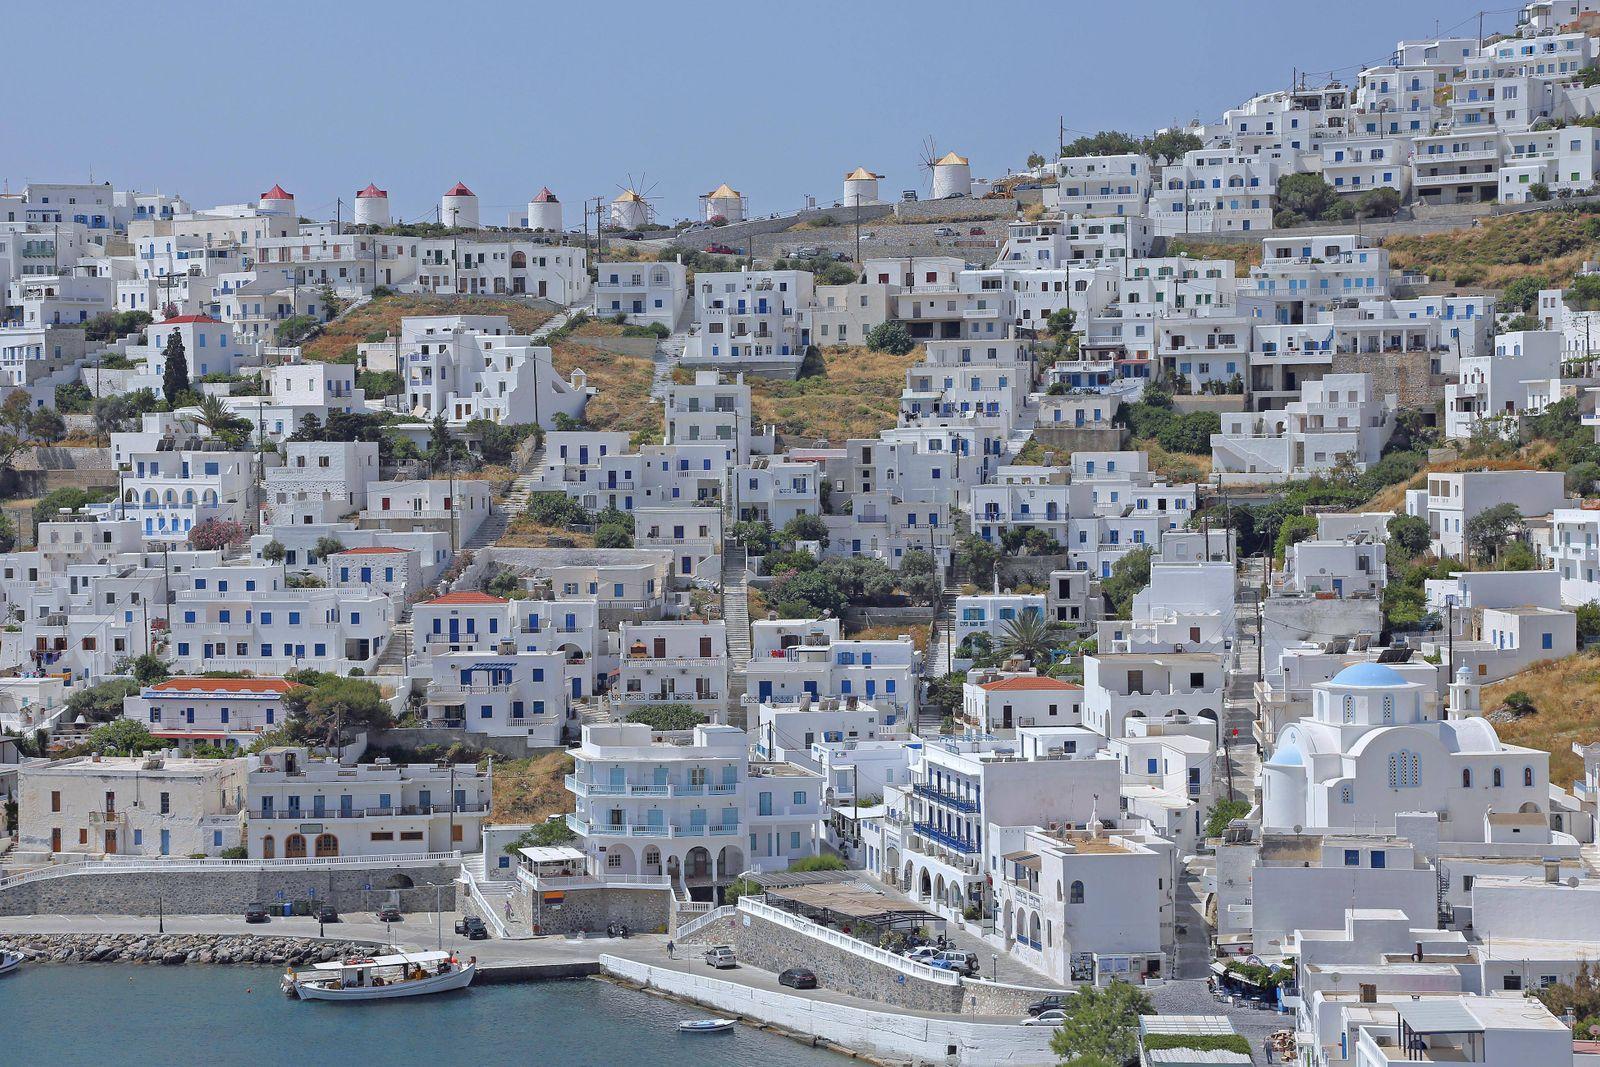 overlooking the picturesque village of chora on the island of astypalea greece PUBLICATIONxINxGERxSU